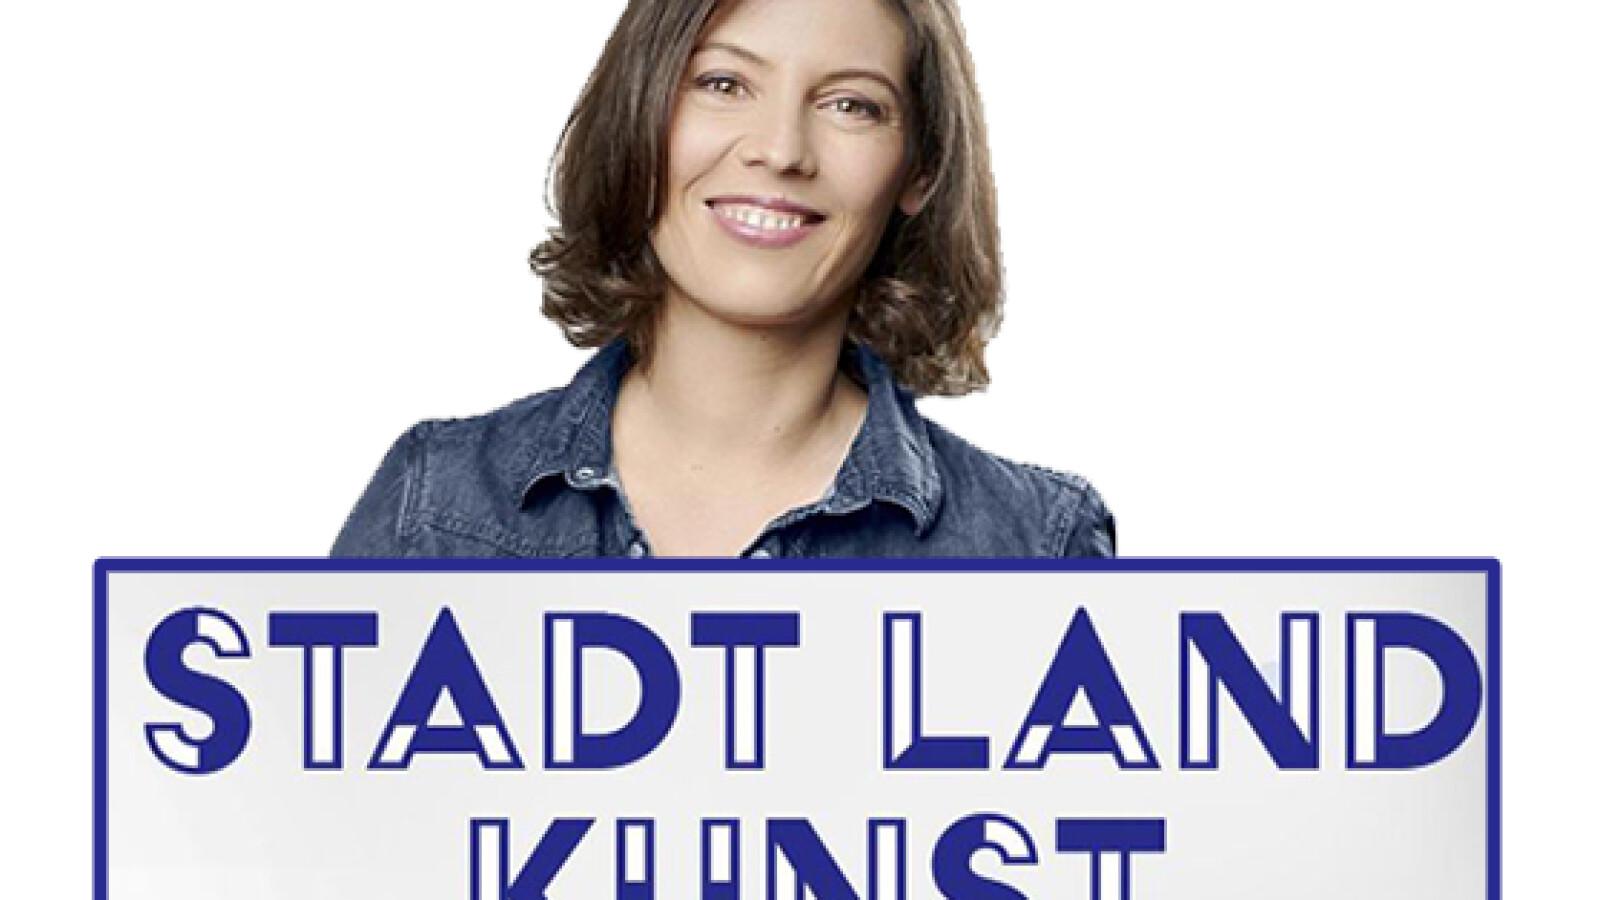 Stadt Land Kunst Moderatorin